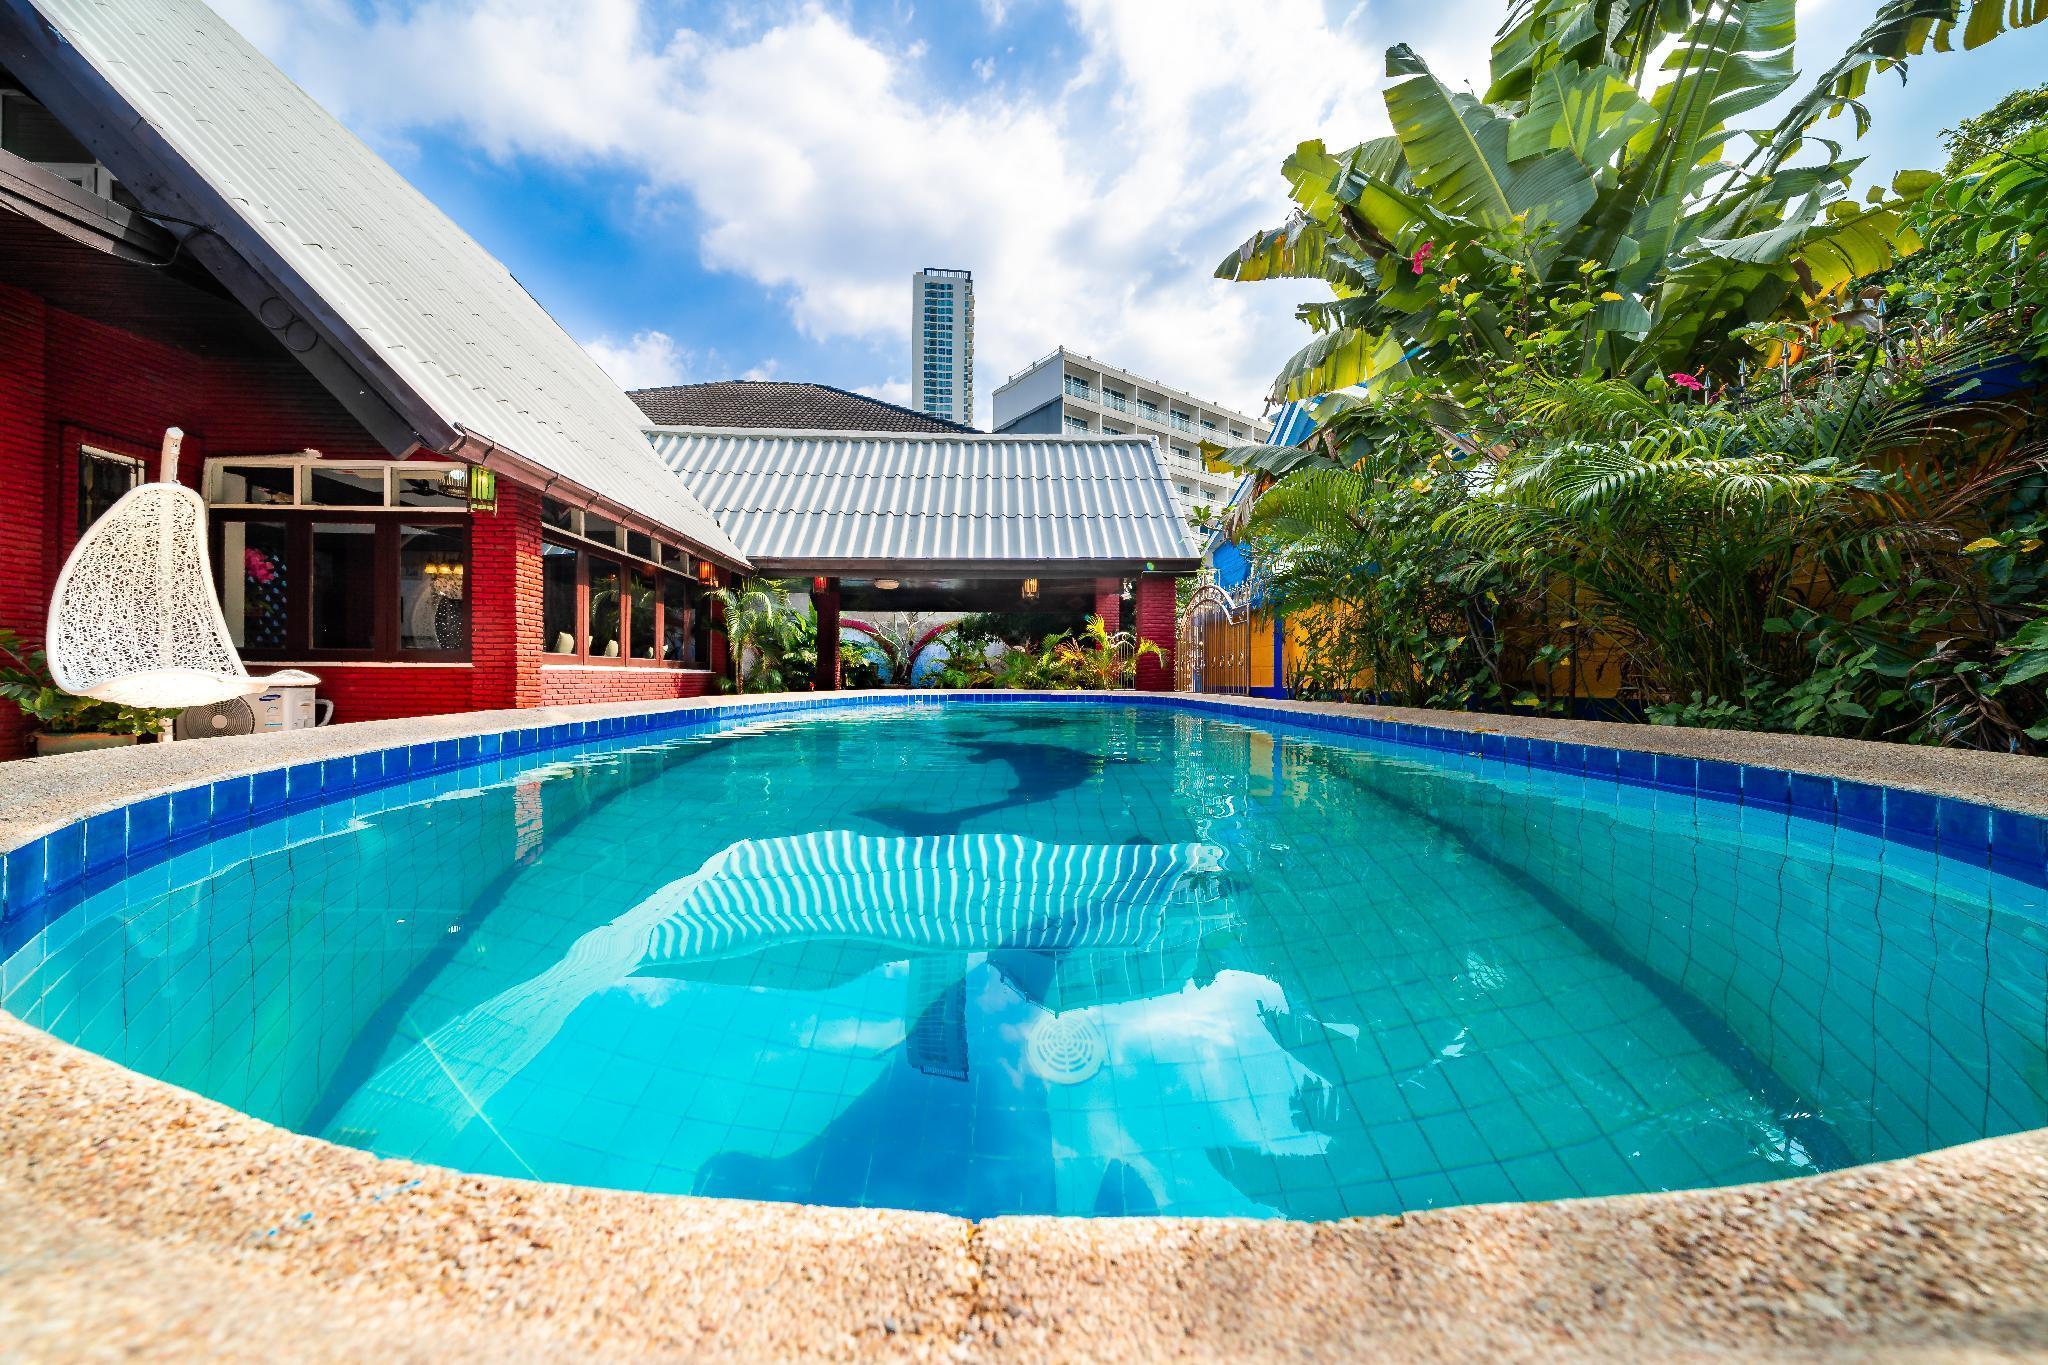 32#Jomtien beach 180M,Luxury modern villas วิลลา 4 ห้องนอน 5 ห้องน้ำส่วนตัว ขนาด 300 ตร.ม. – หาดจอมเทียน